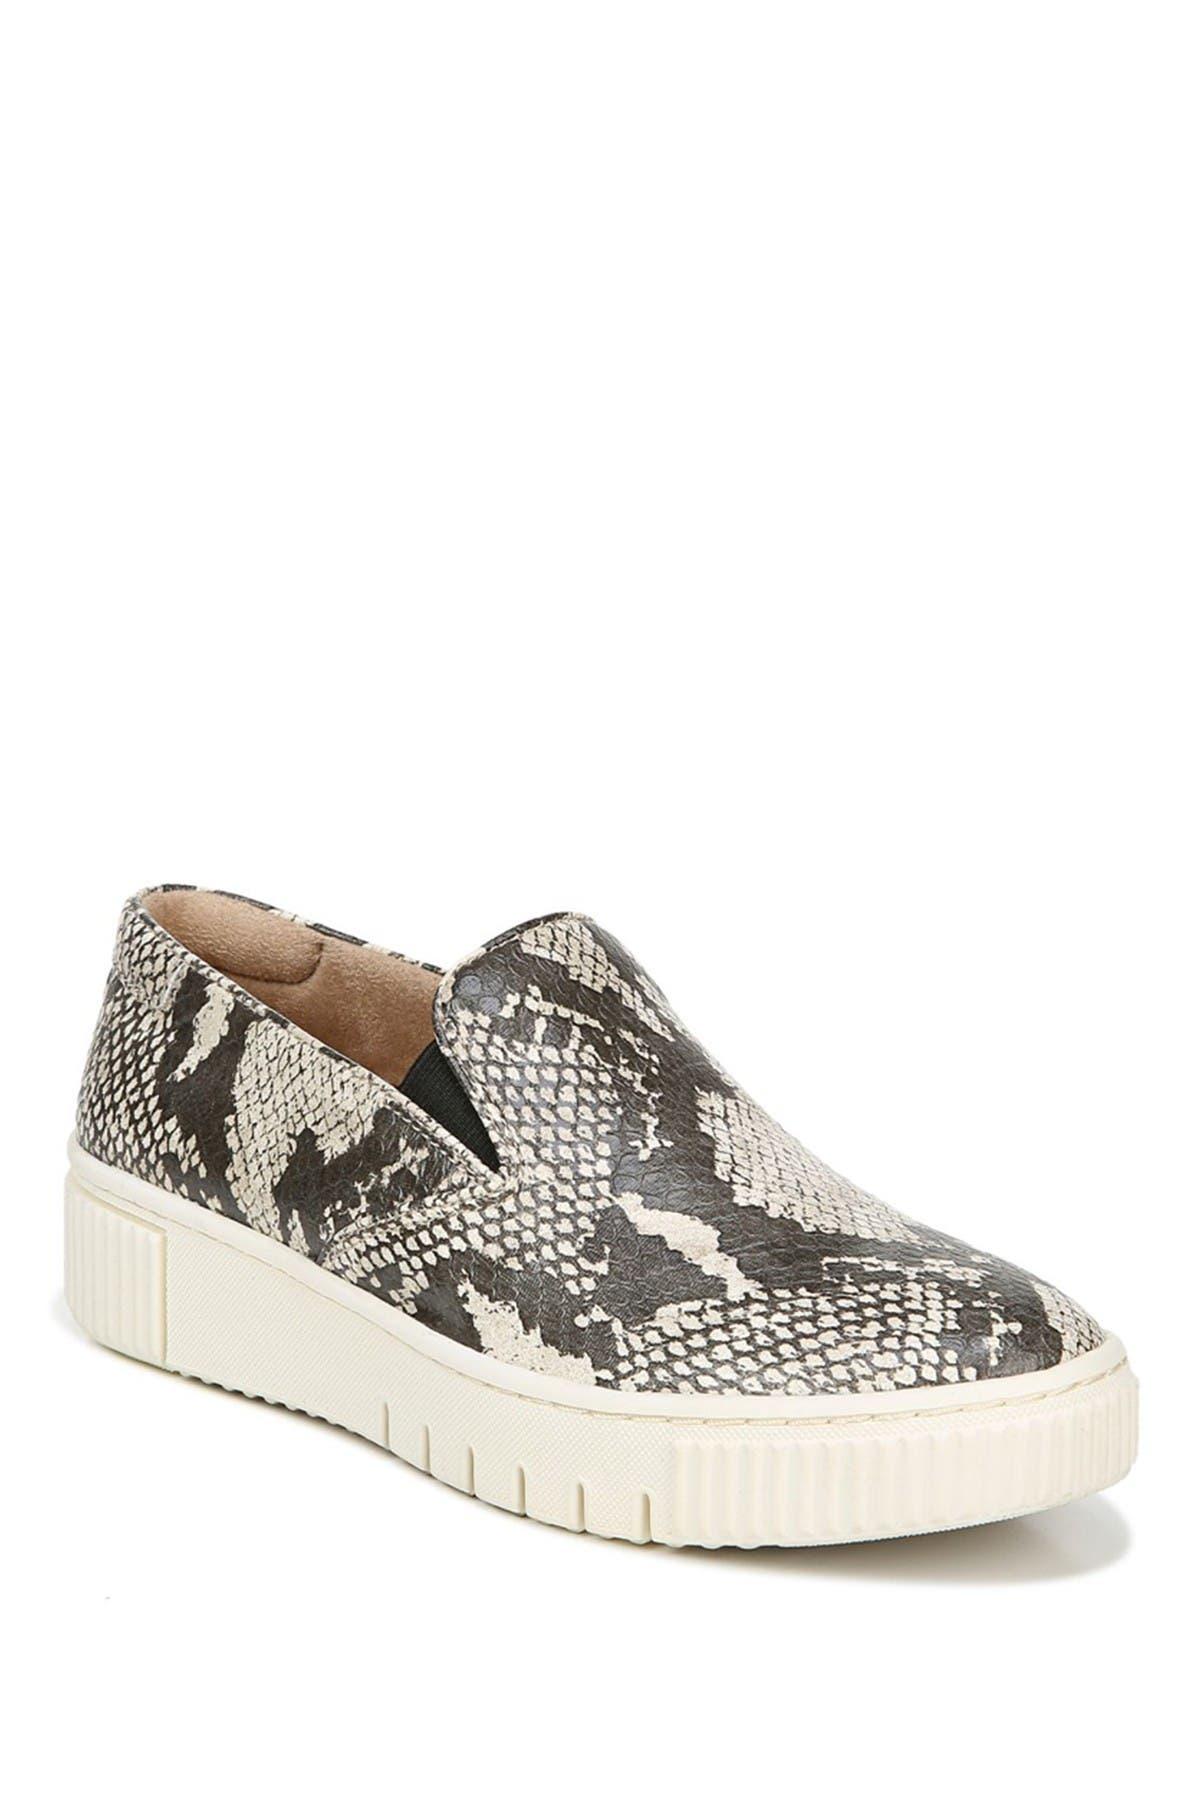 Image of SOUL Naturalizer Tia 2 Snakeskin Embossed Platform Slip-On Sneaker